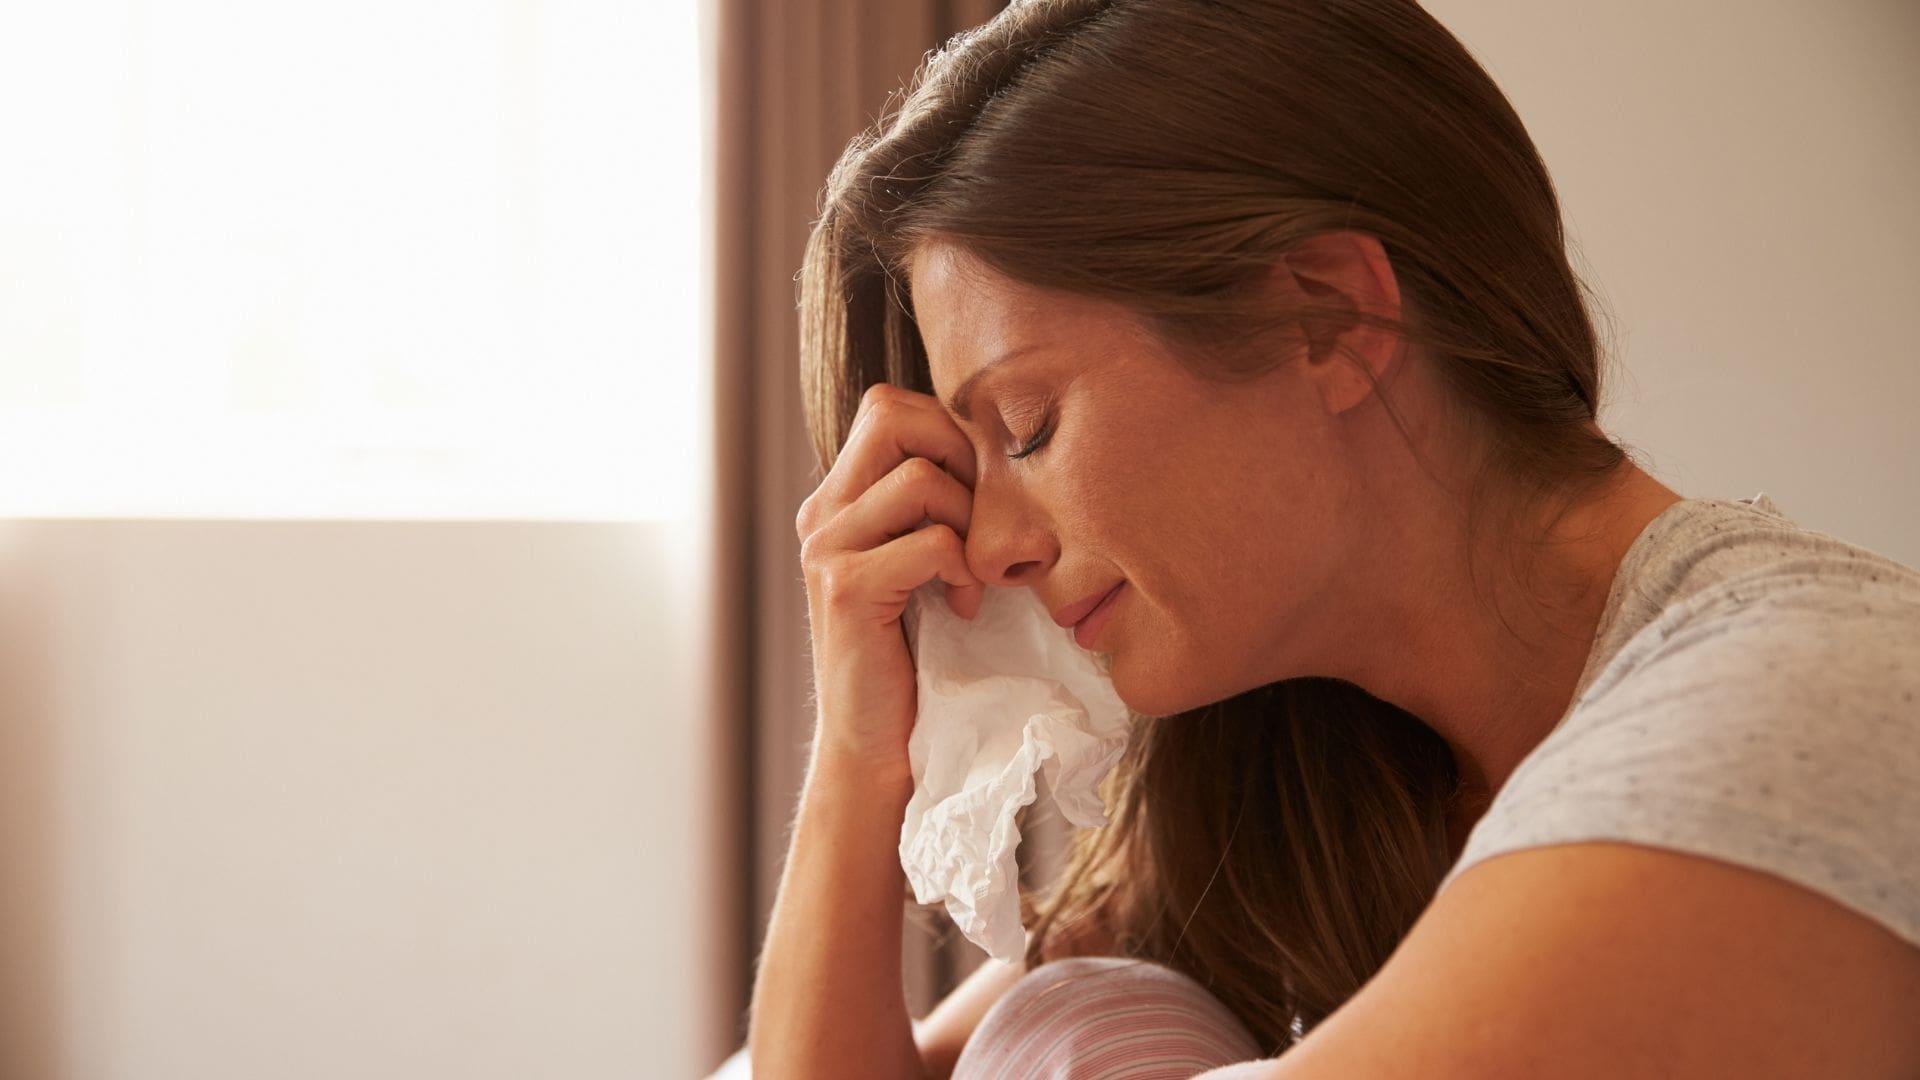 Birth Trauma and PTSD